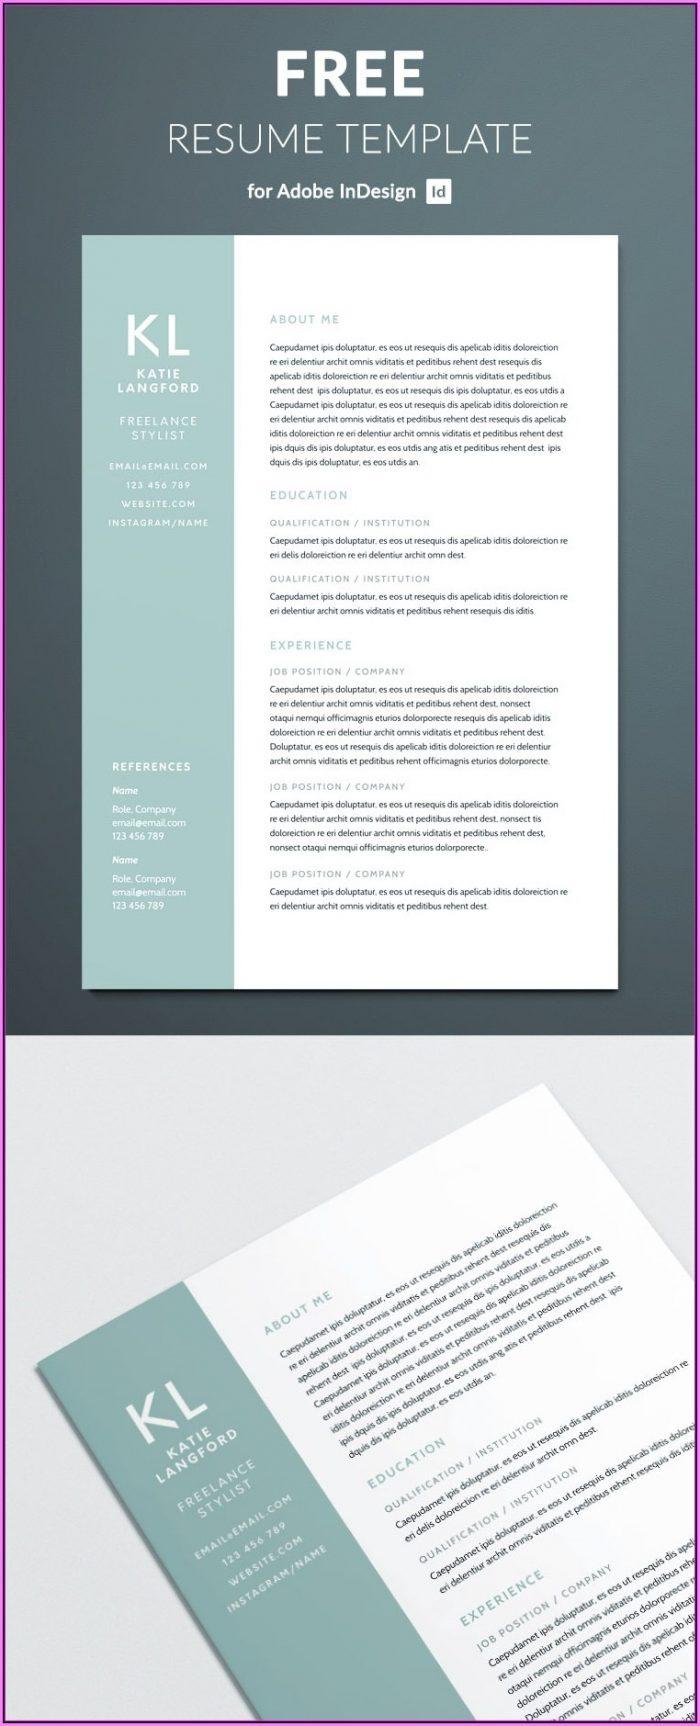 Resume Example Pdf Free Download